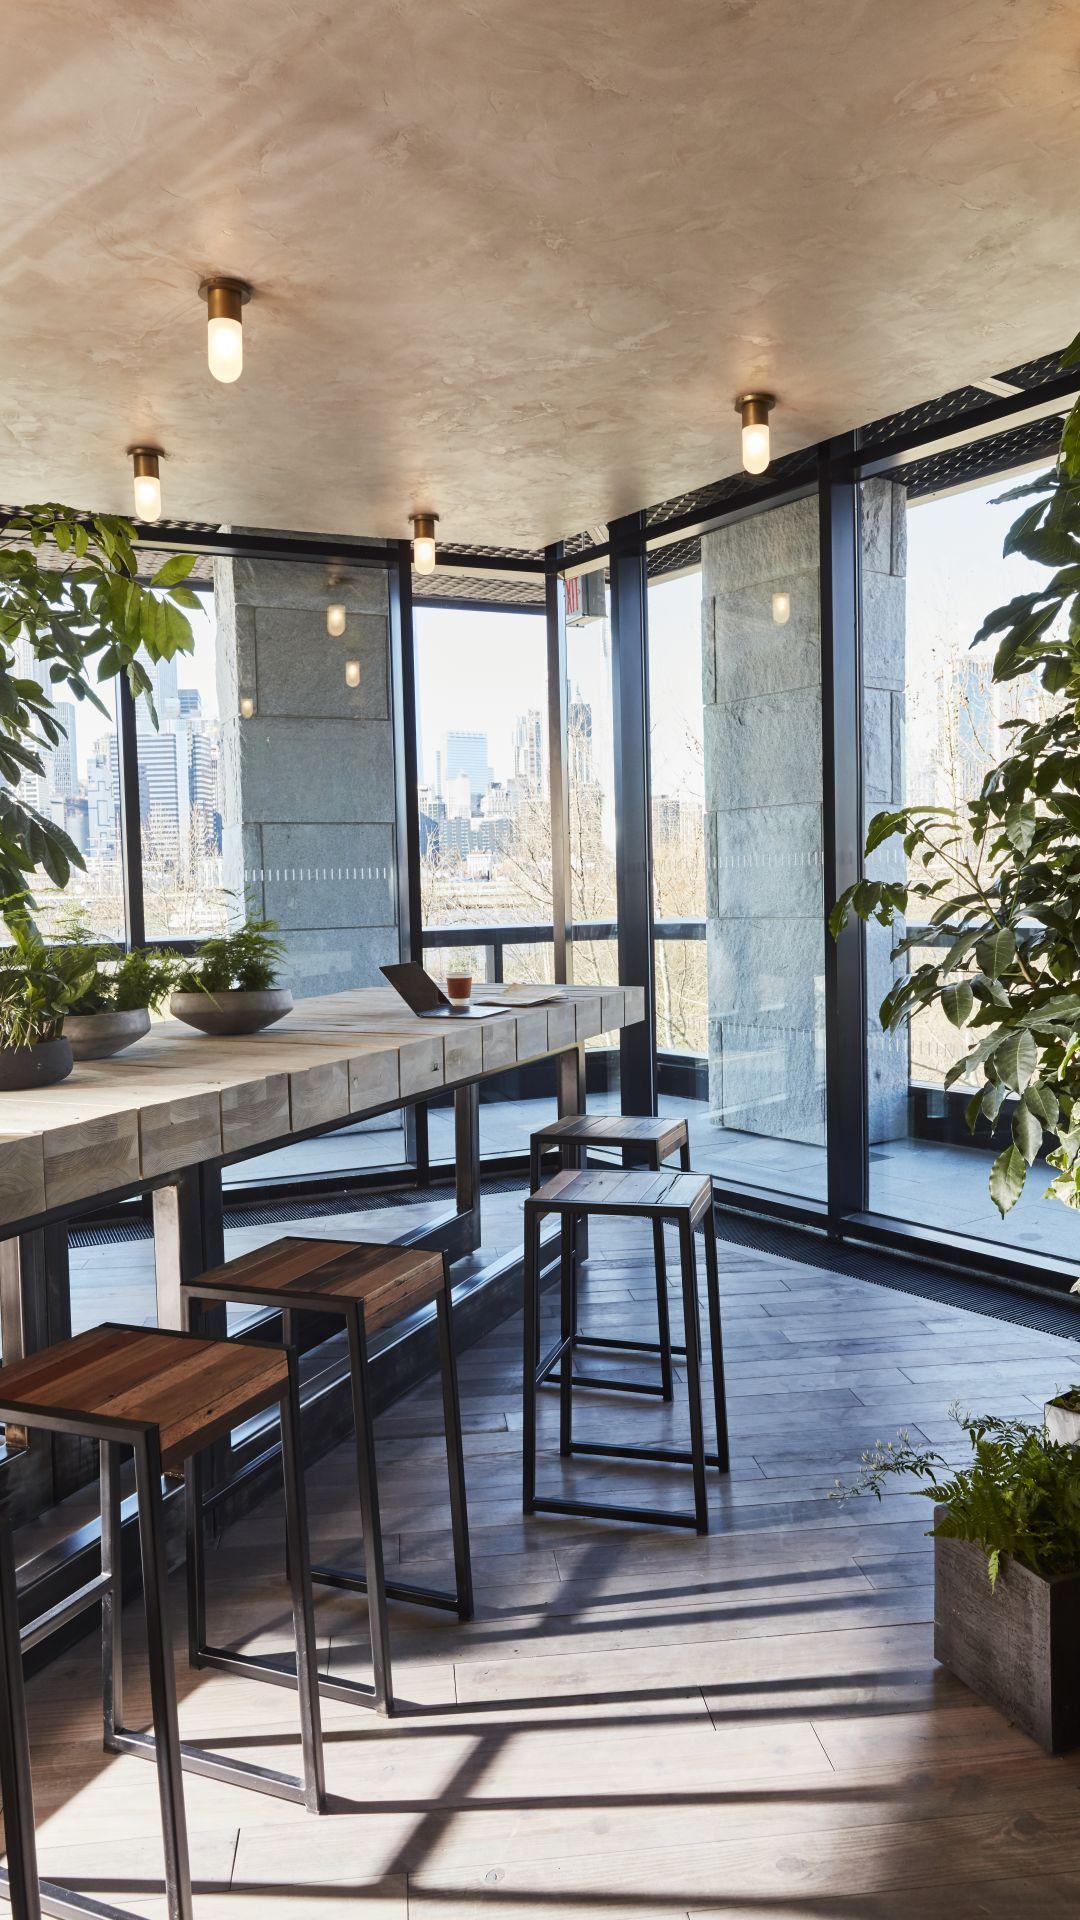 Hotel Rooms Interior Design: 1 Hotel Brooklyn Bridge In New York City